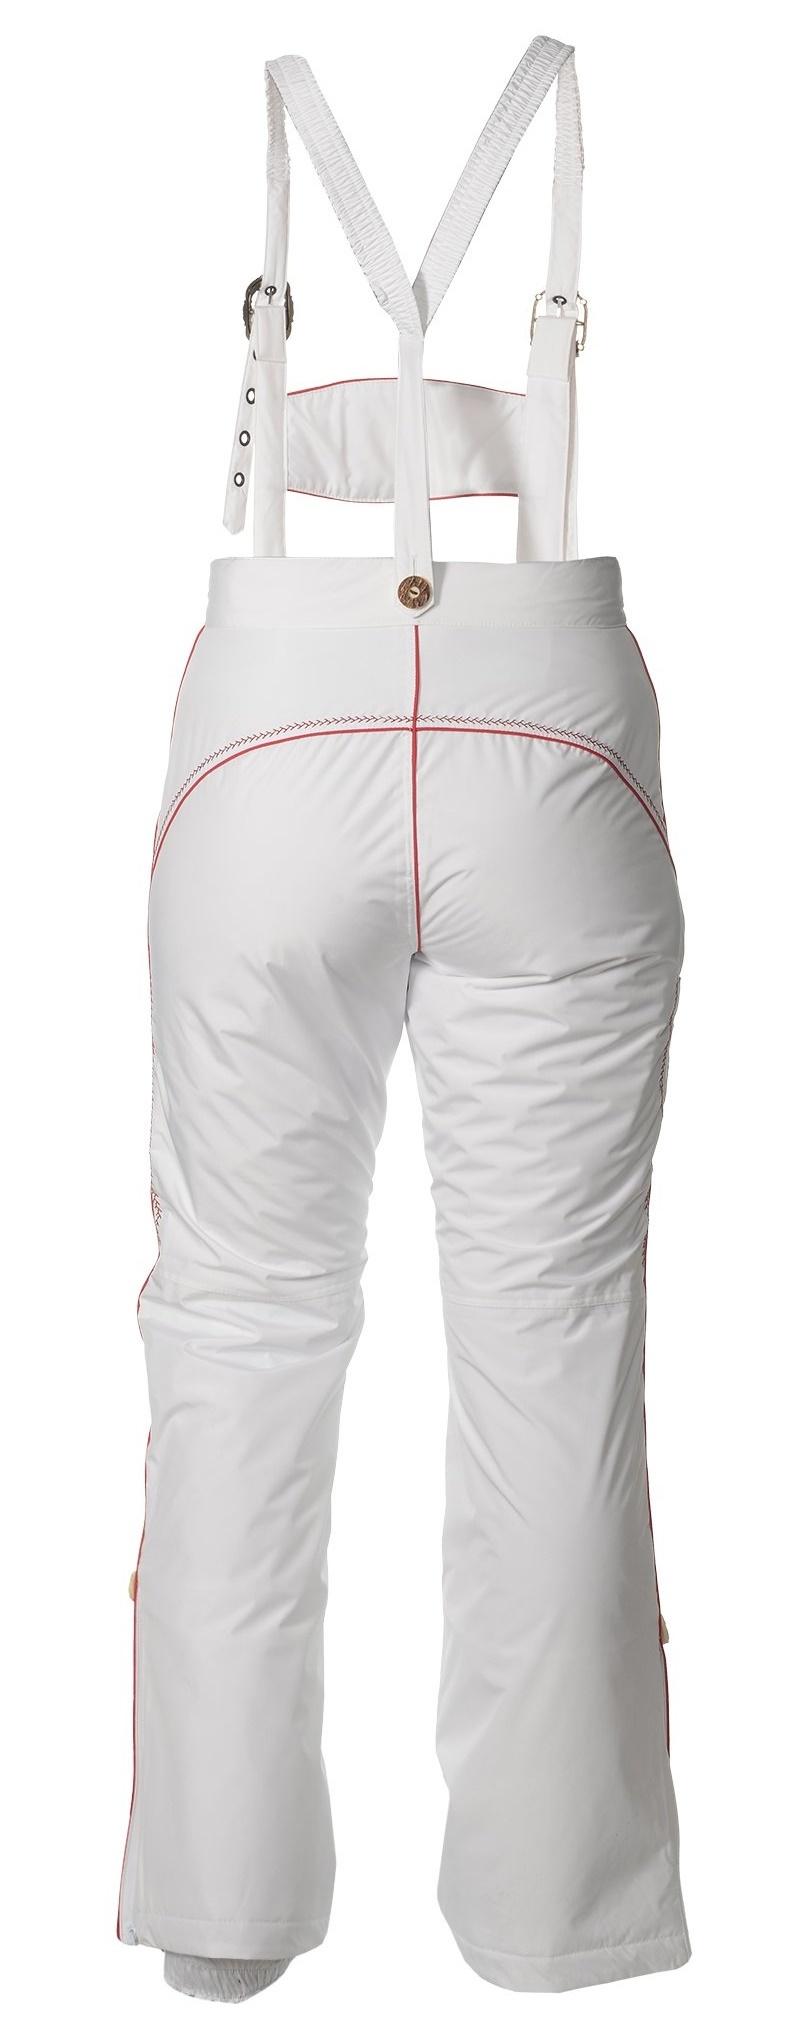 Женские горнолыжные брюки Lois Almrausch 121426-0126 белые